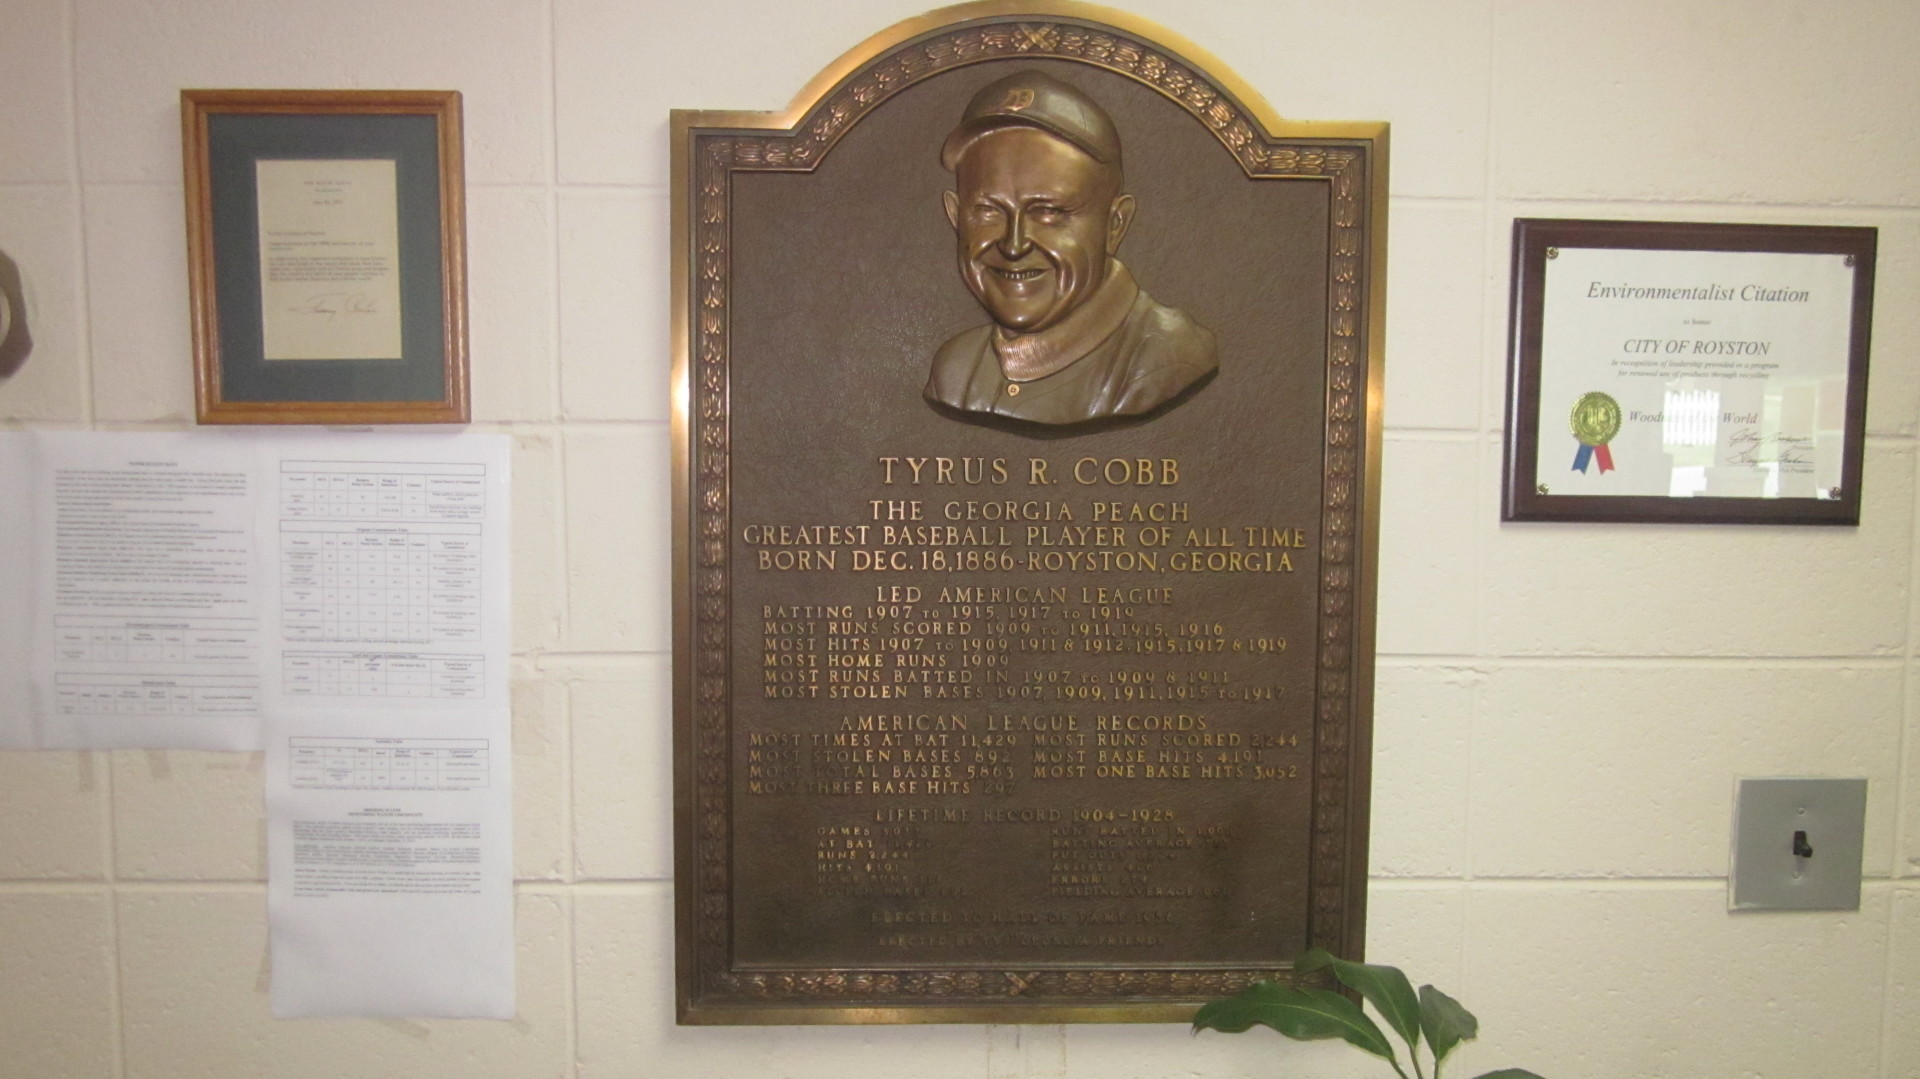 Ty Cobb plaque in City Hall Royston, Georgia